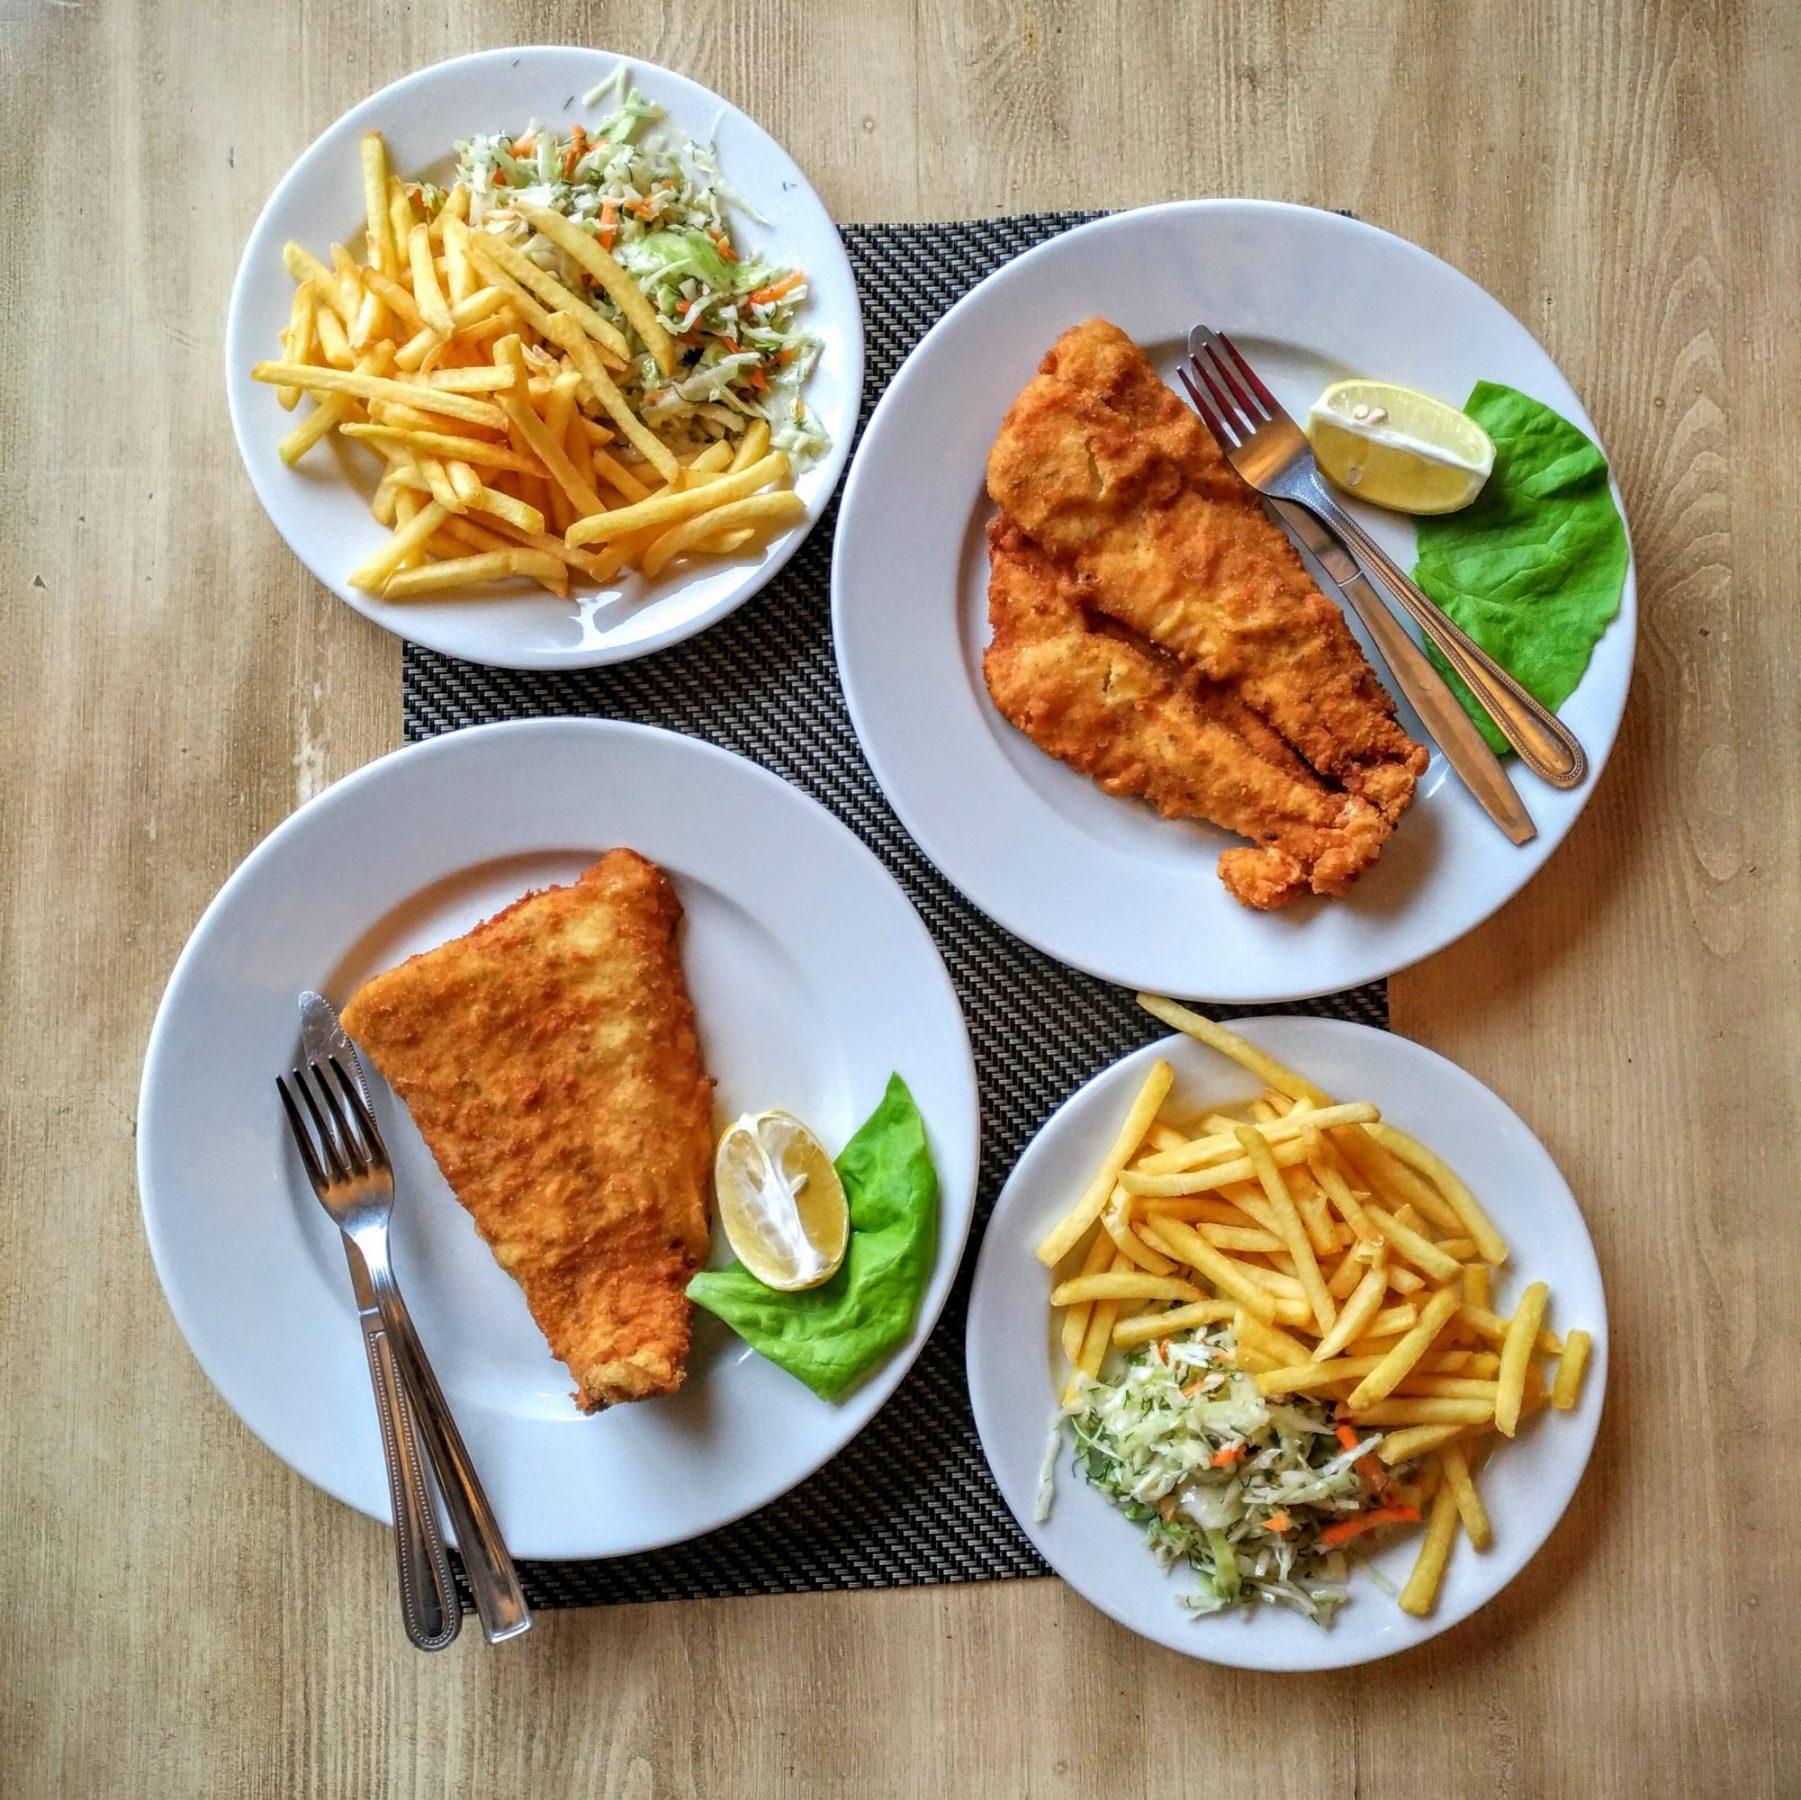 Smażona ryba, frytki i surówka